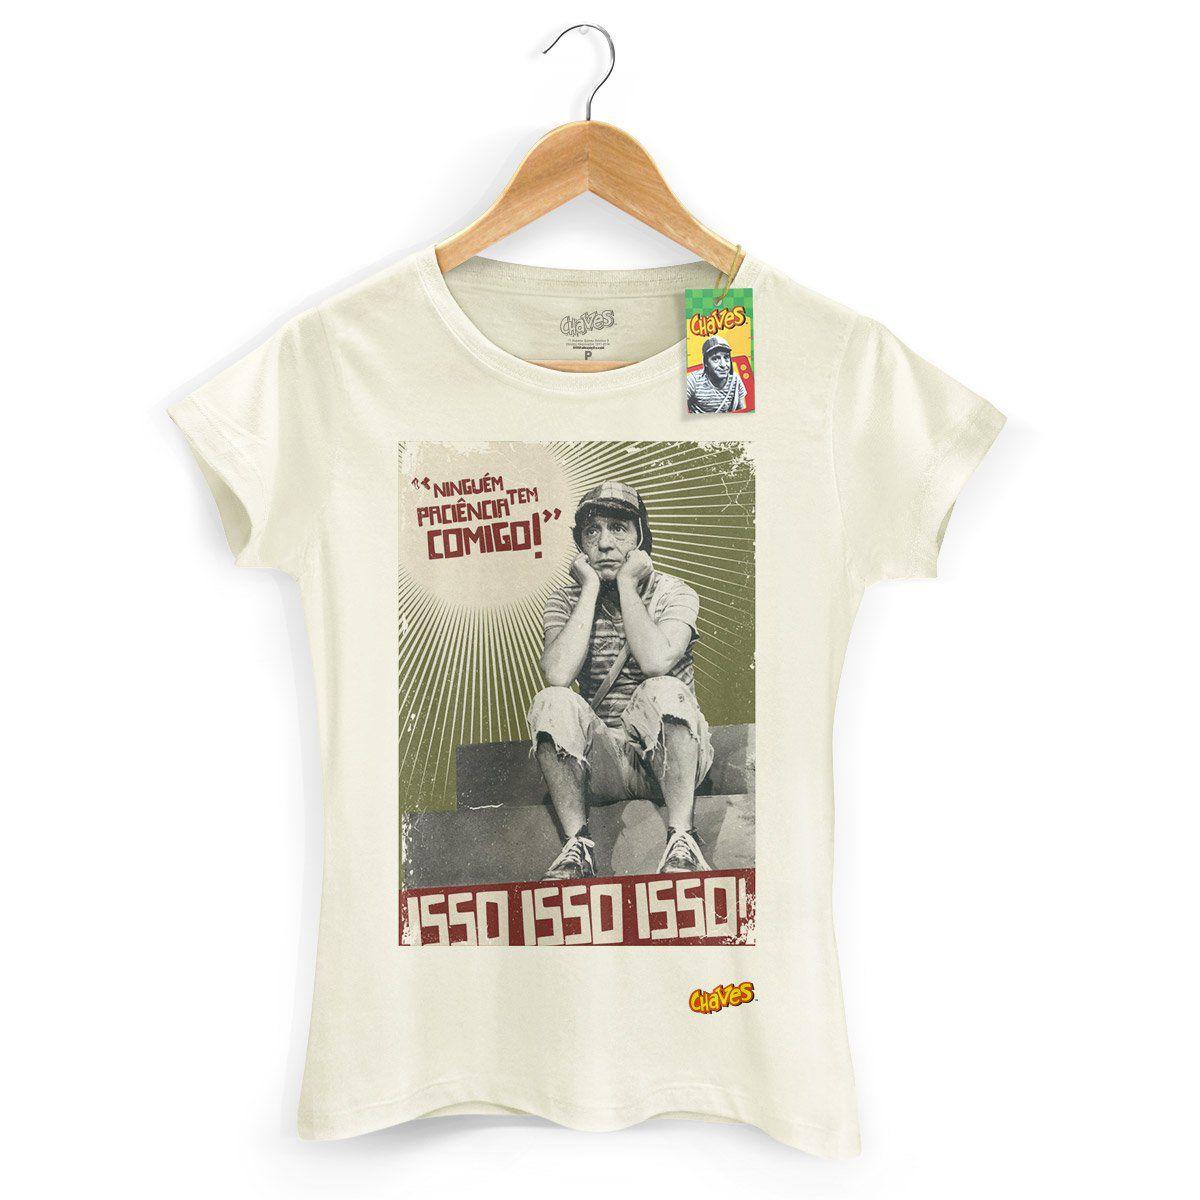 Camiseta Feminina Chaves Ninguém Tem Paciência Comigo! 2  - bandUP Store Marketplace